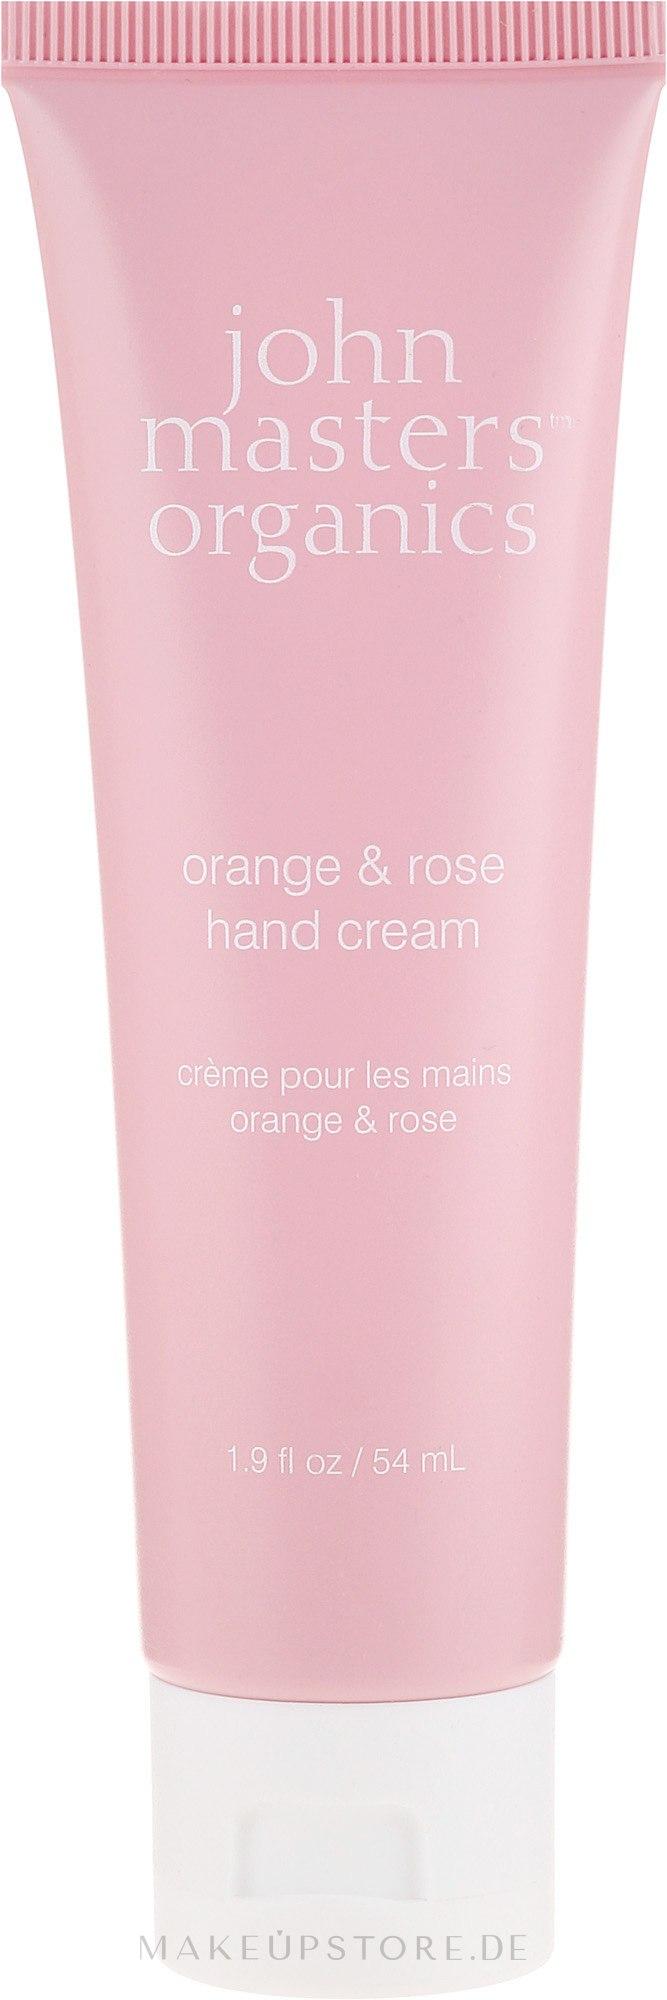 Handcreme mit Orange und Rose - John Masters Organics Orange & Rose Hand Cream — Bild 54 ml